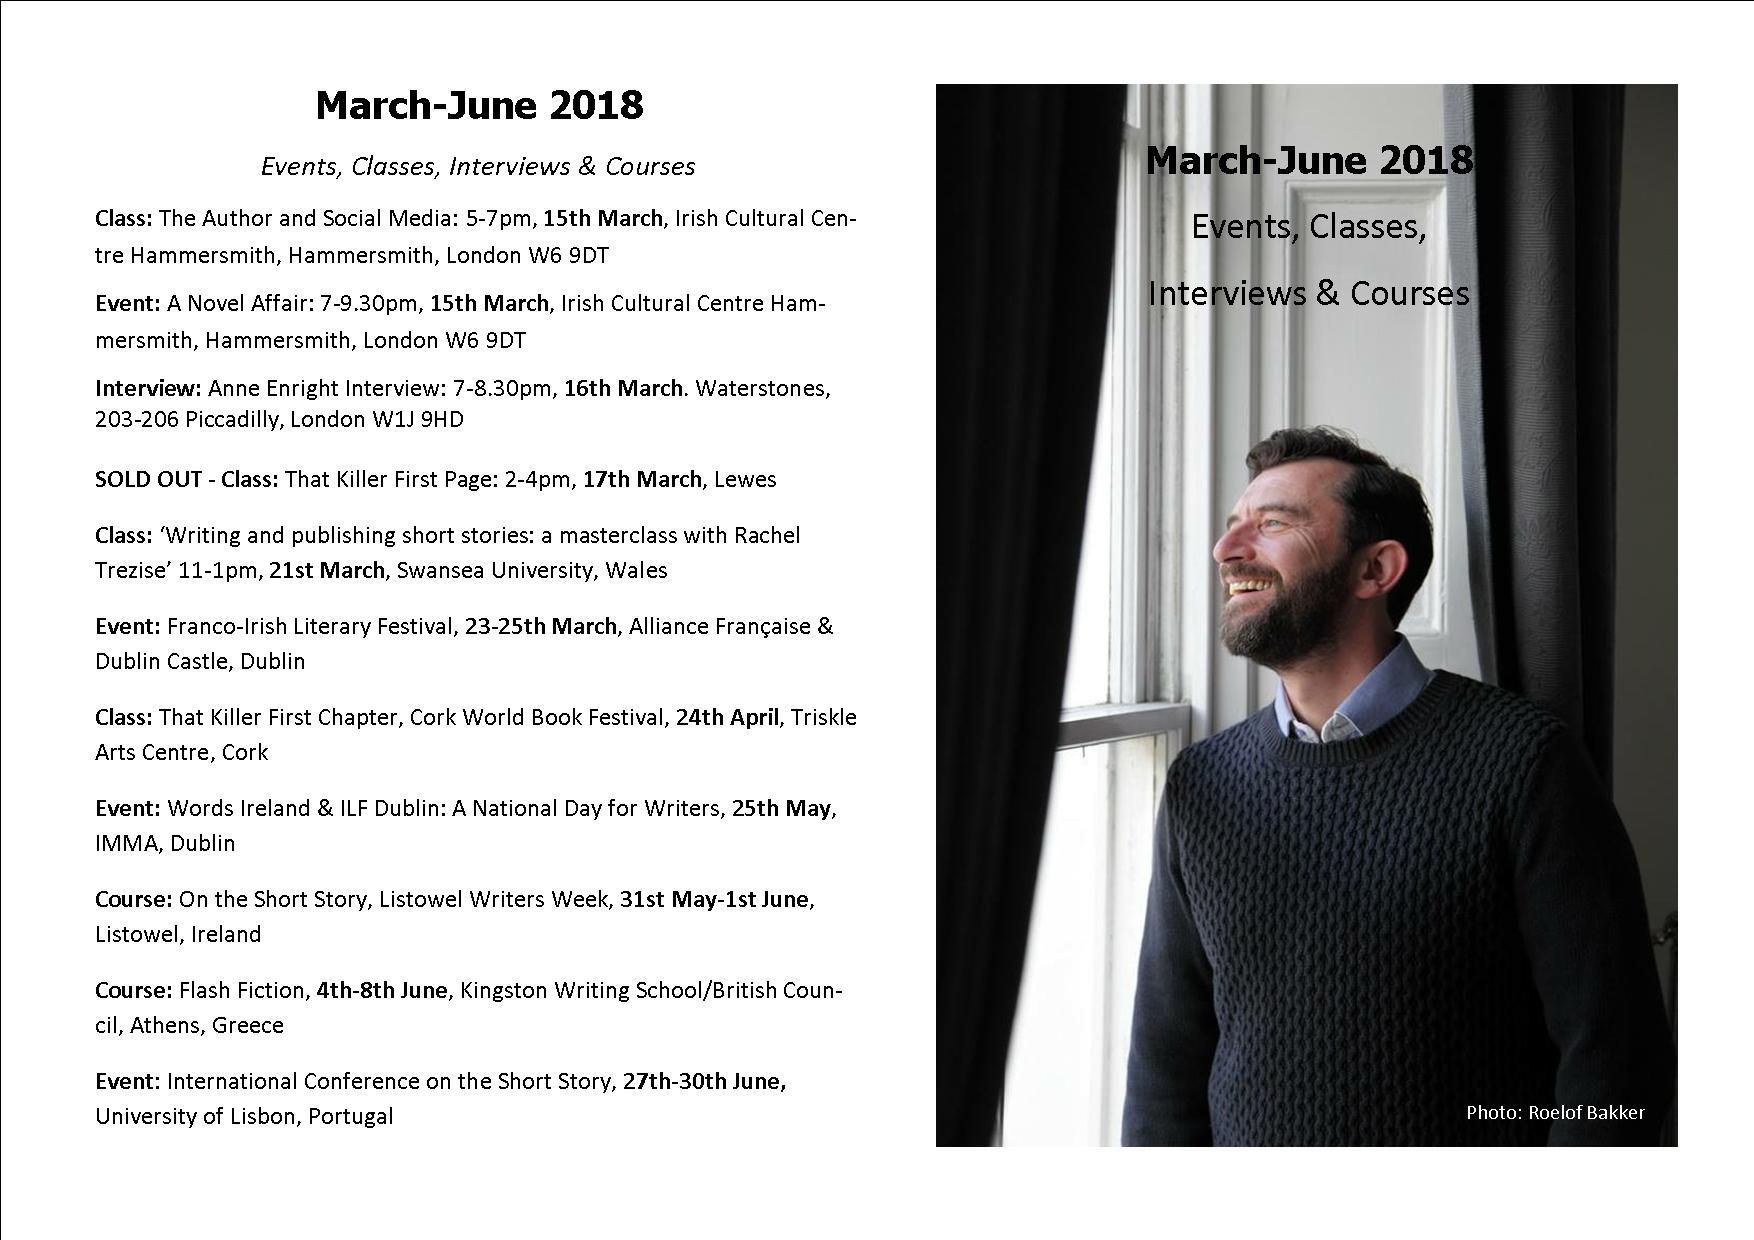 March-June 2018